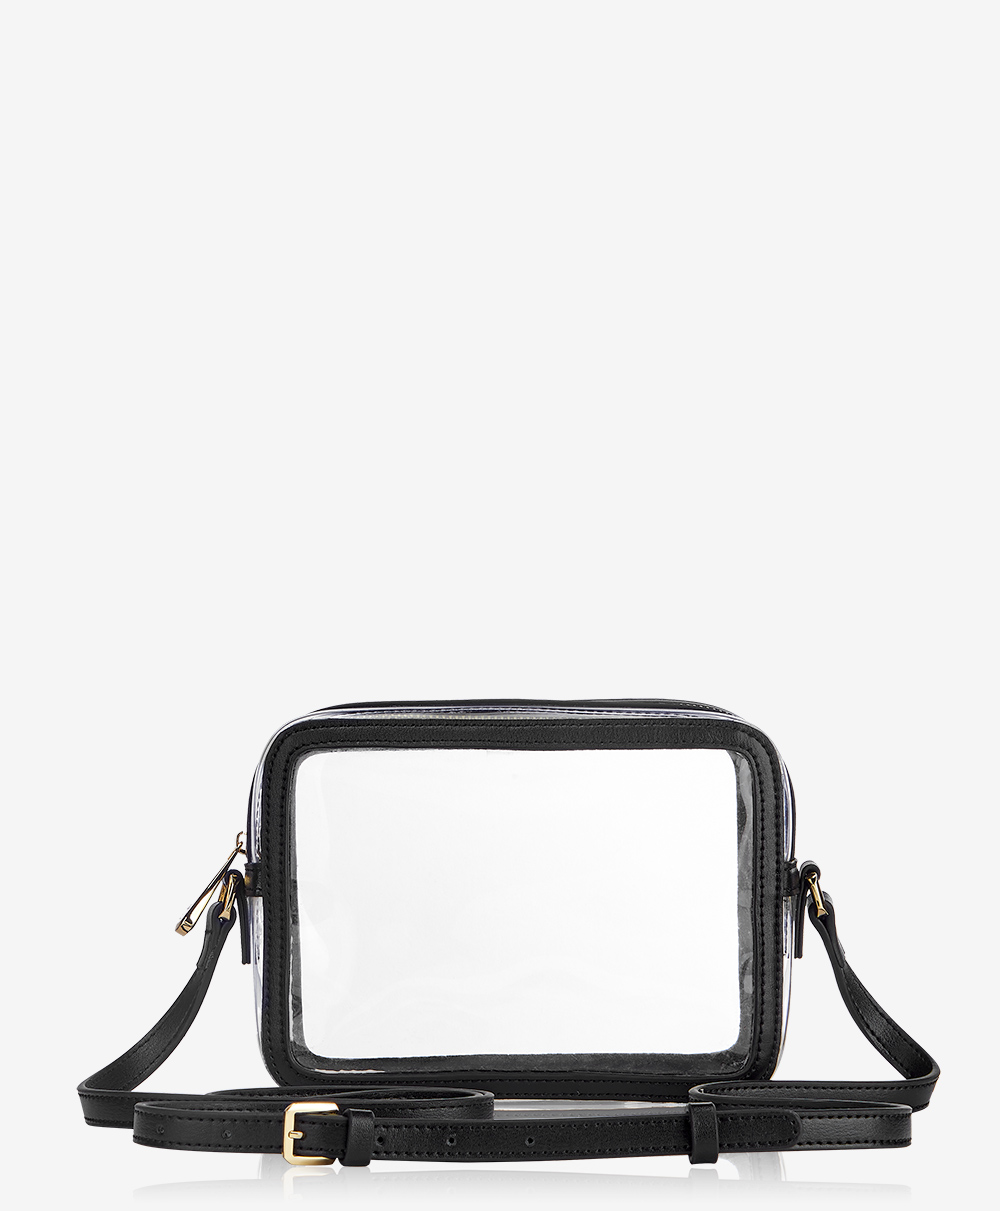 Collins Crossbody Handbag Clear with Black Vachetta Trim